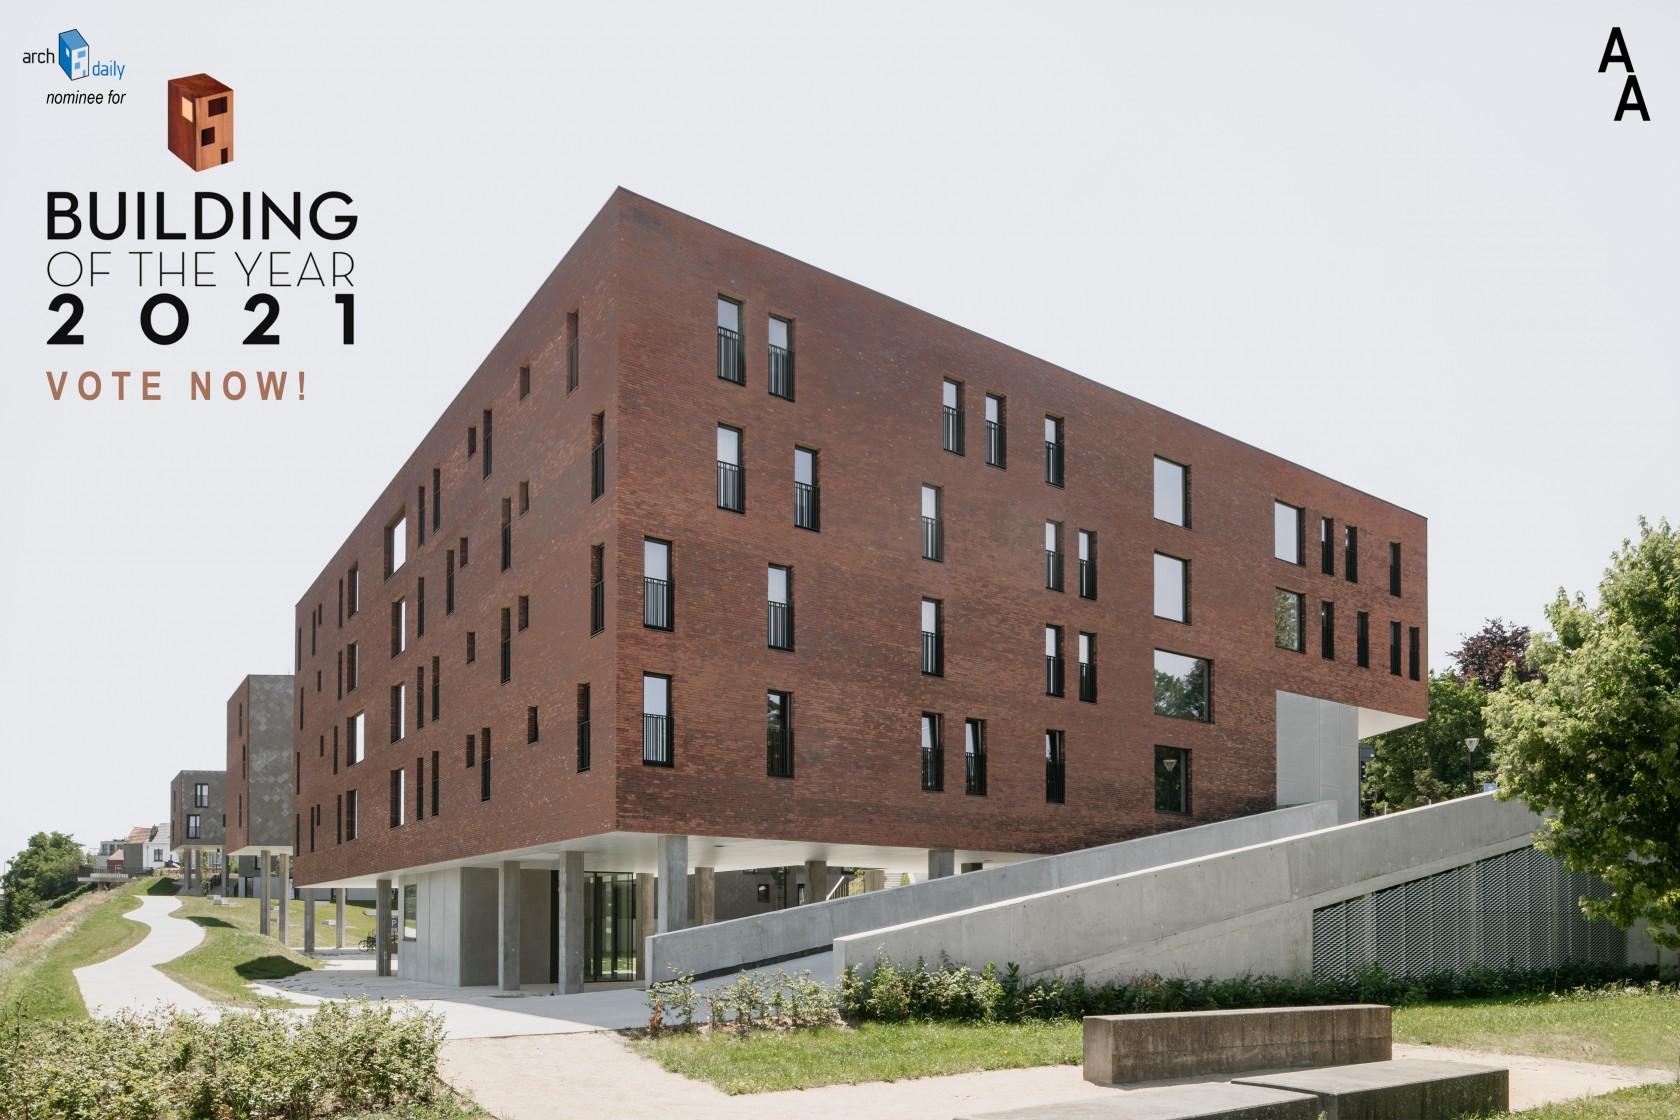 Abscis Architecten - Klein Rijsel, Leuven - Building of the Year 2021 ArchDaily - vote now!